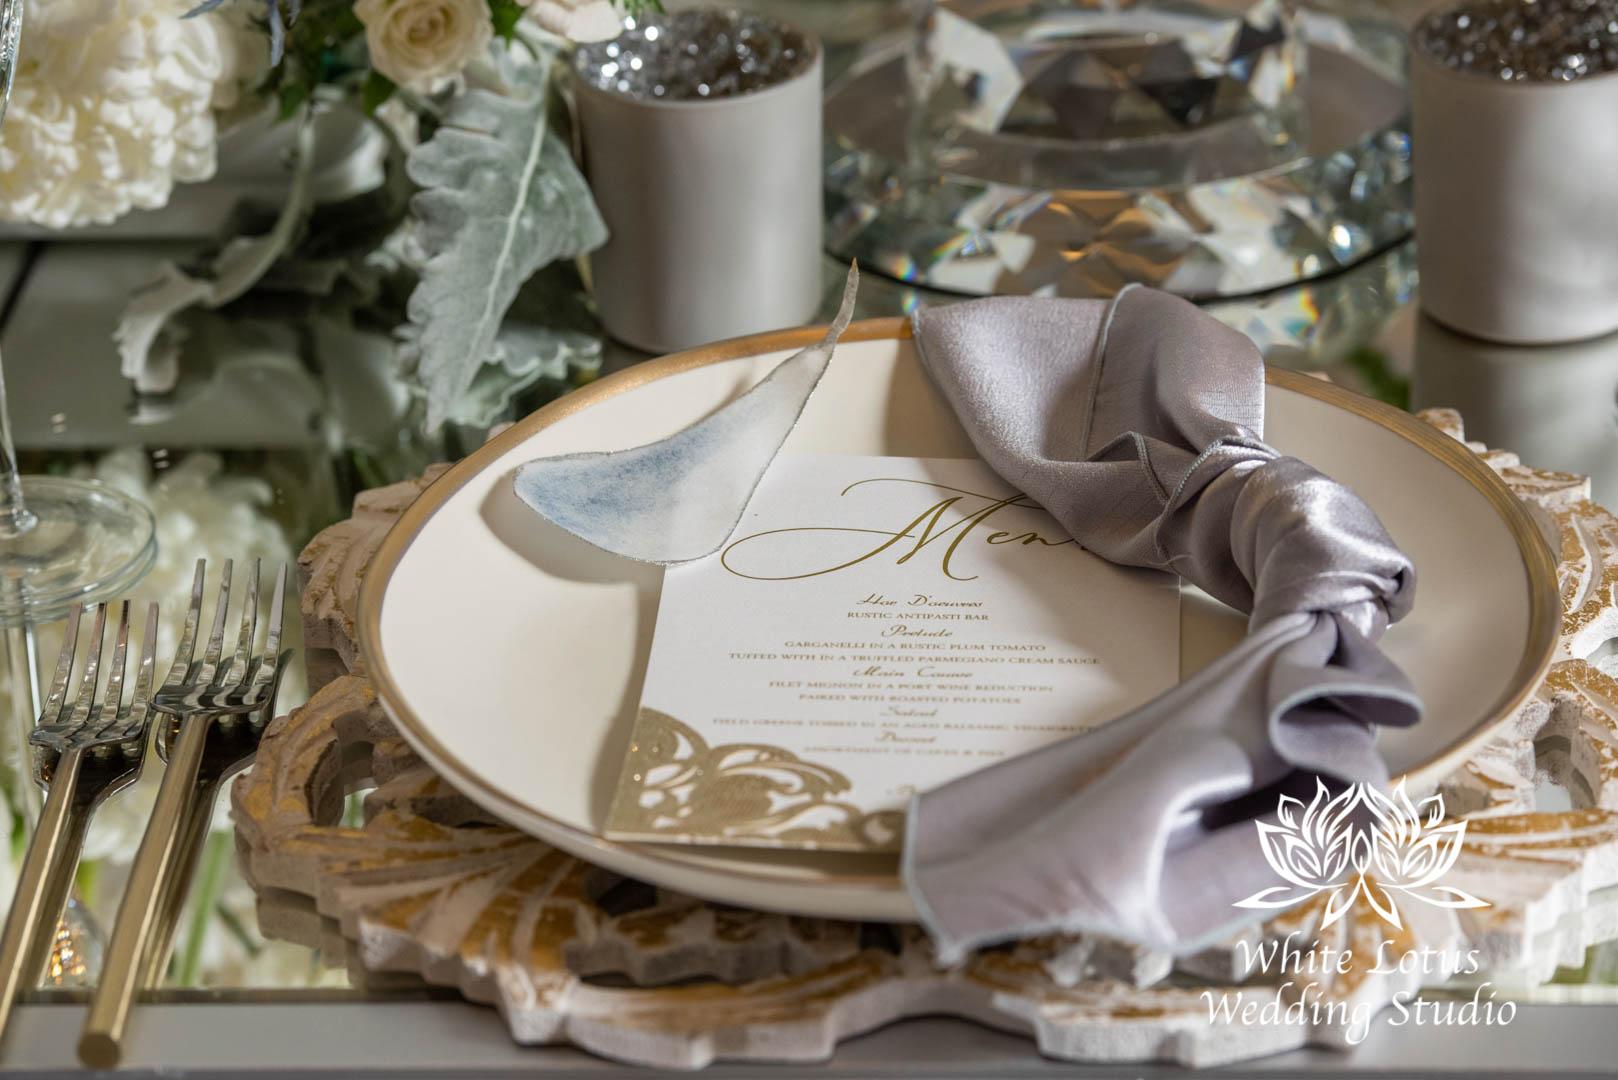 174- GLAM WINTERLUXE WEDDING INSPIRATION